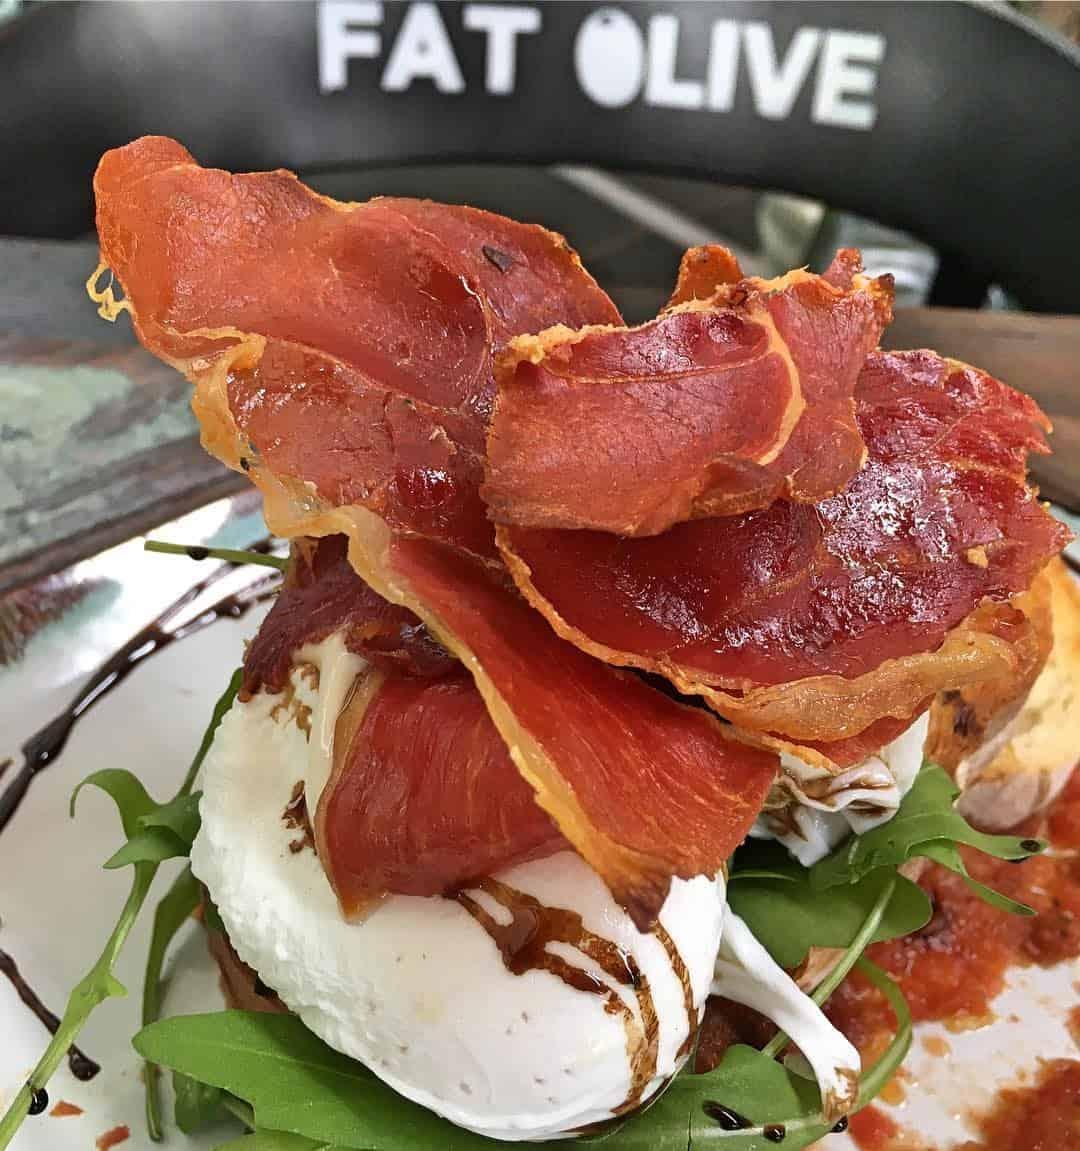 Fat-Olive-Mont-Kiara-Mediterranean-Spanish-restaurant-Kuala-Lumpur-Travel-Mermaid-2